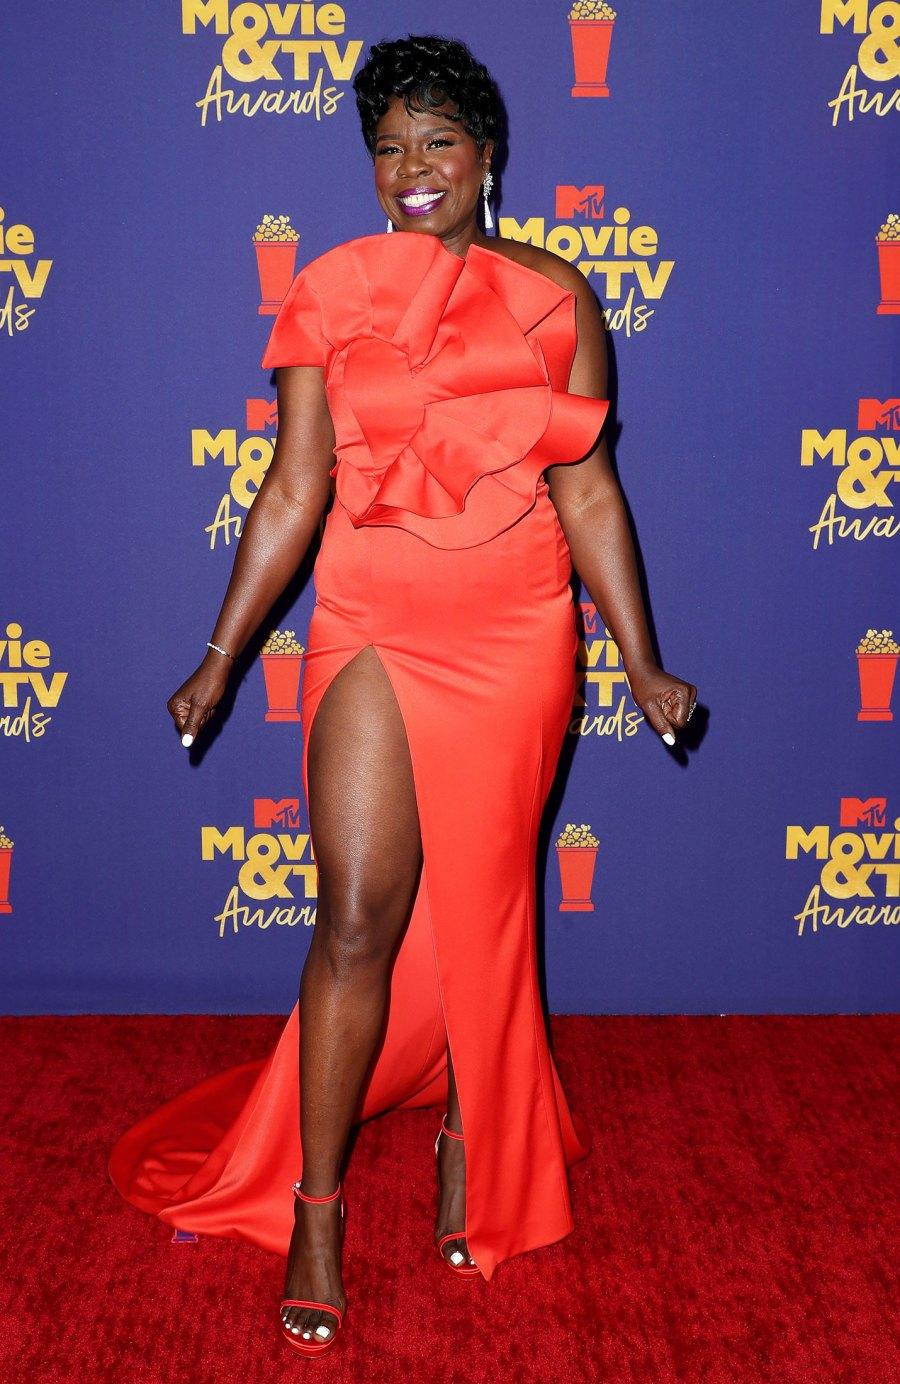 MTV Movie & TV Awards Red Carpet Arrivals - Leslie Jones